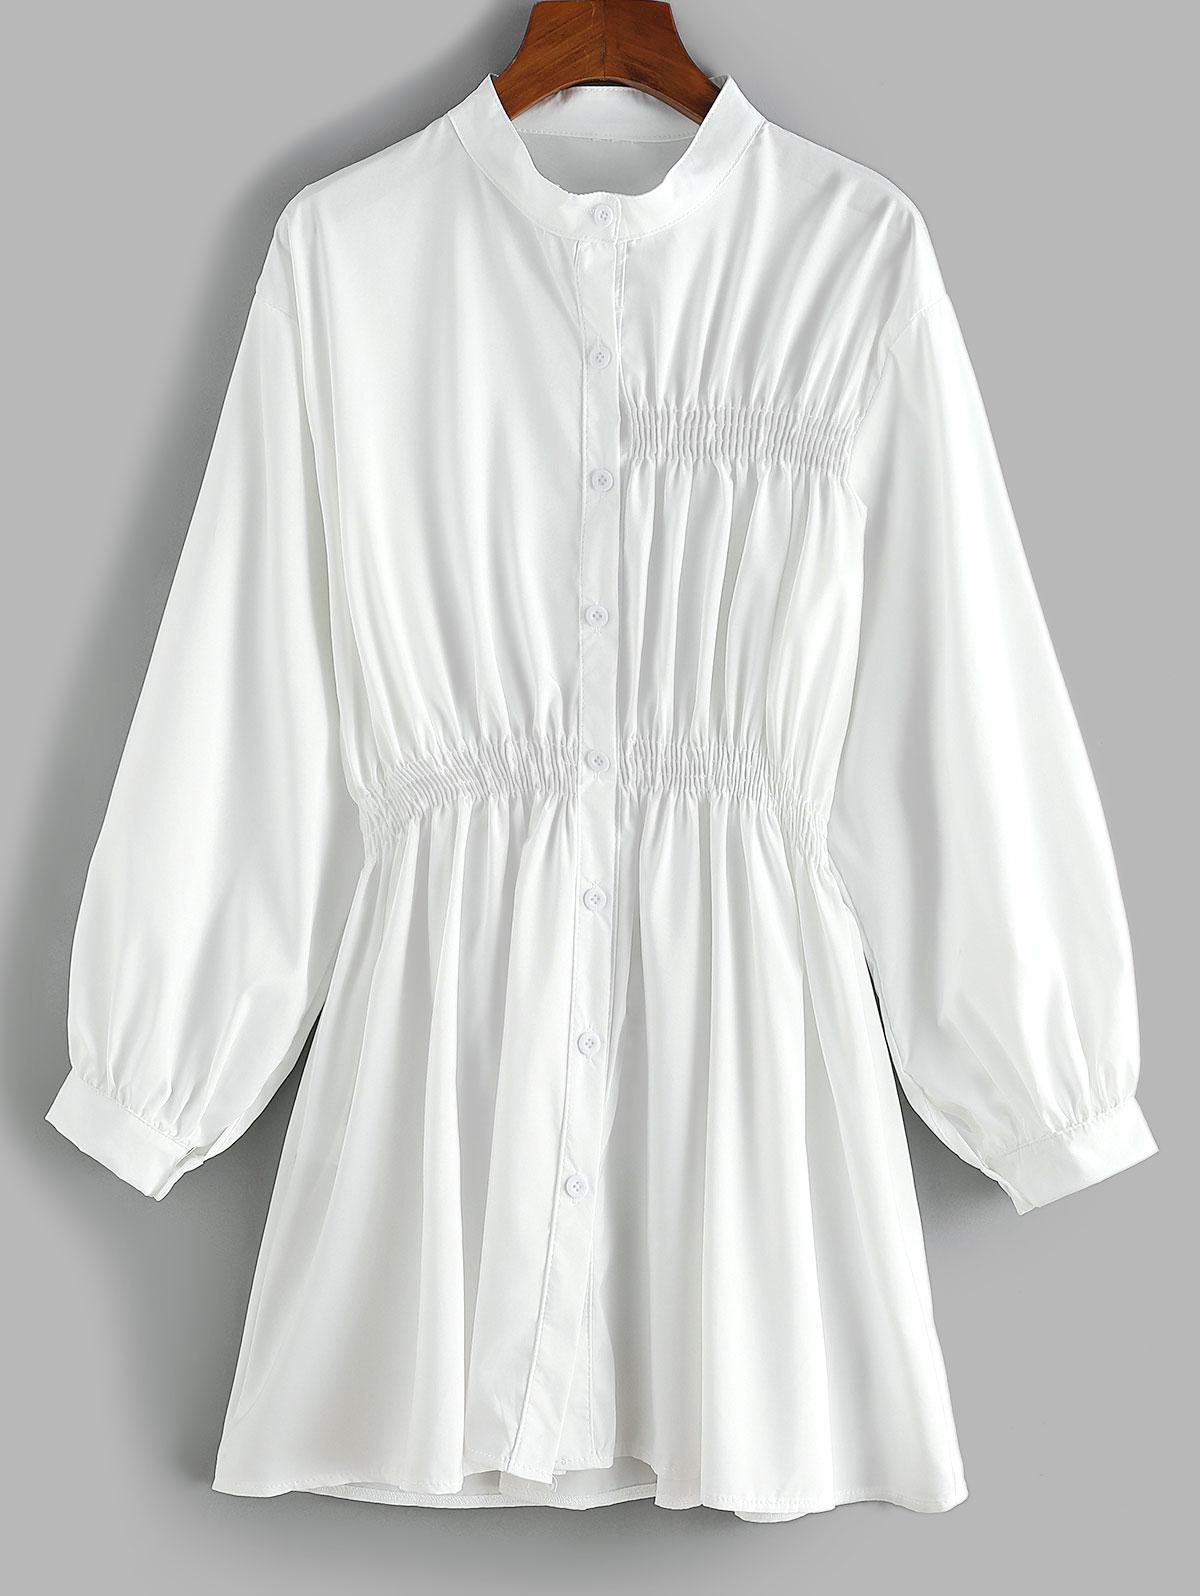 Robe Chemise Taille Plissée à Manches Longues - ZAFUL - Modalova